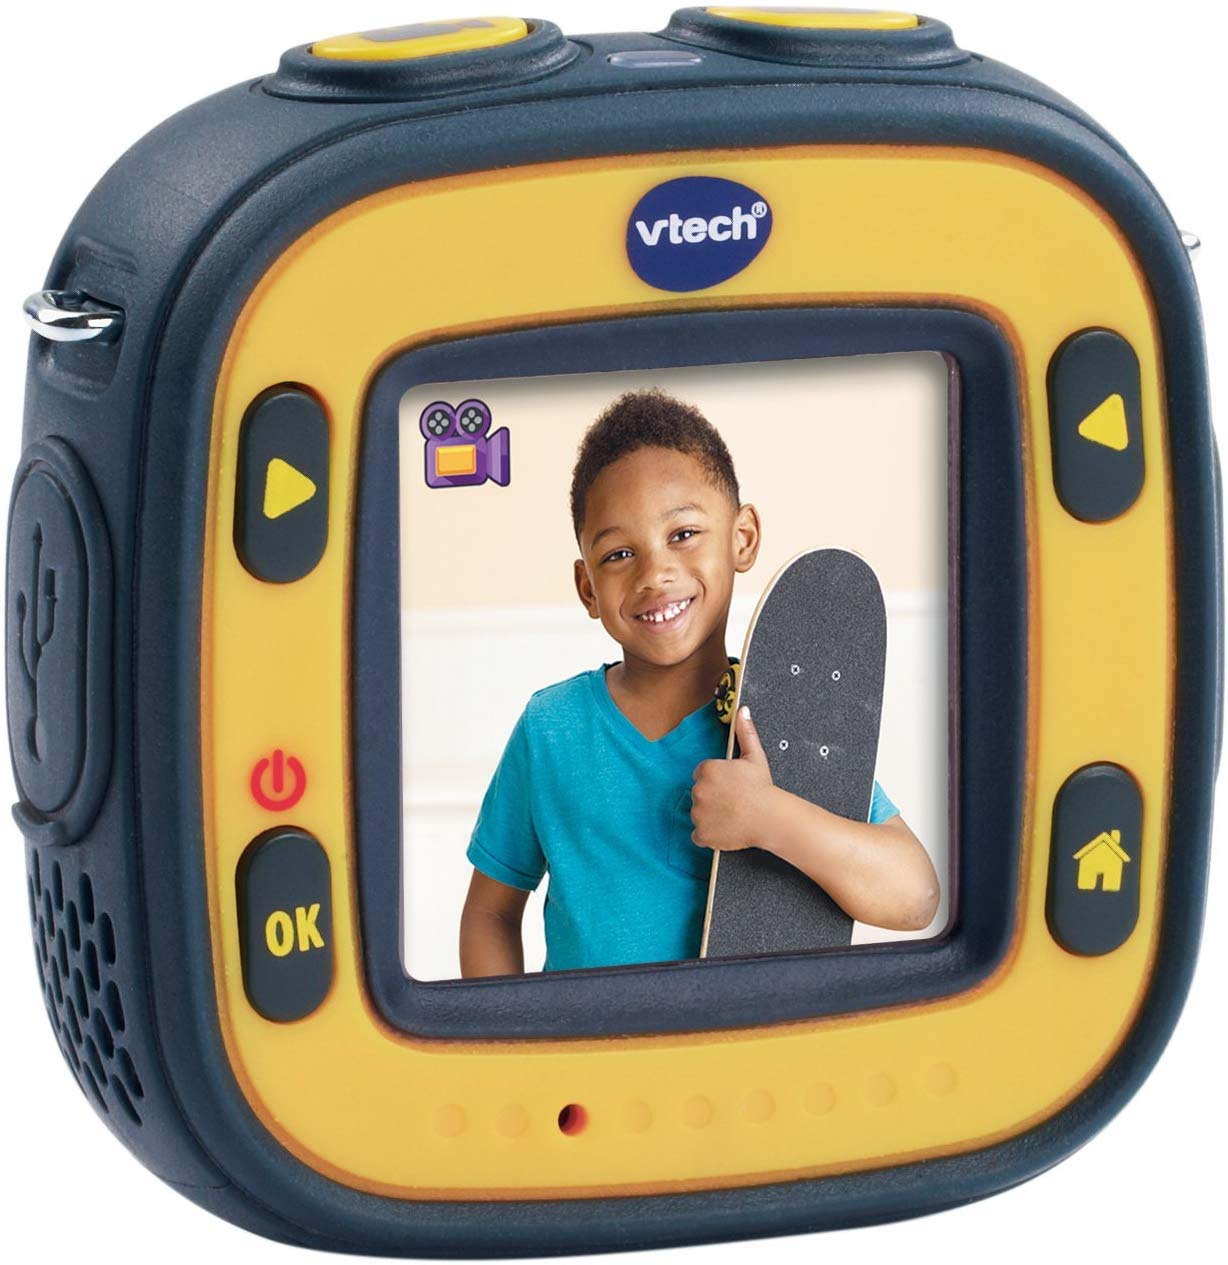 Vtech Kidizoom action camera